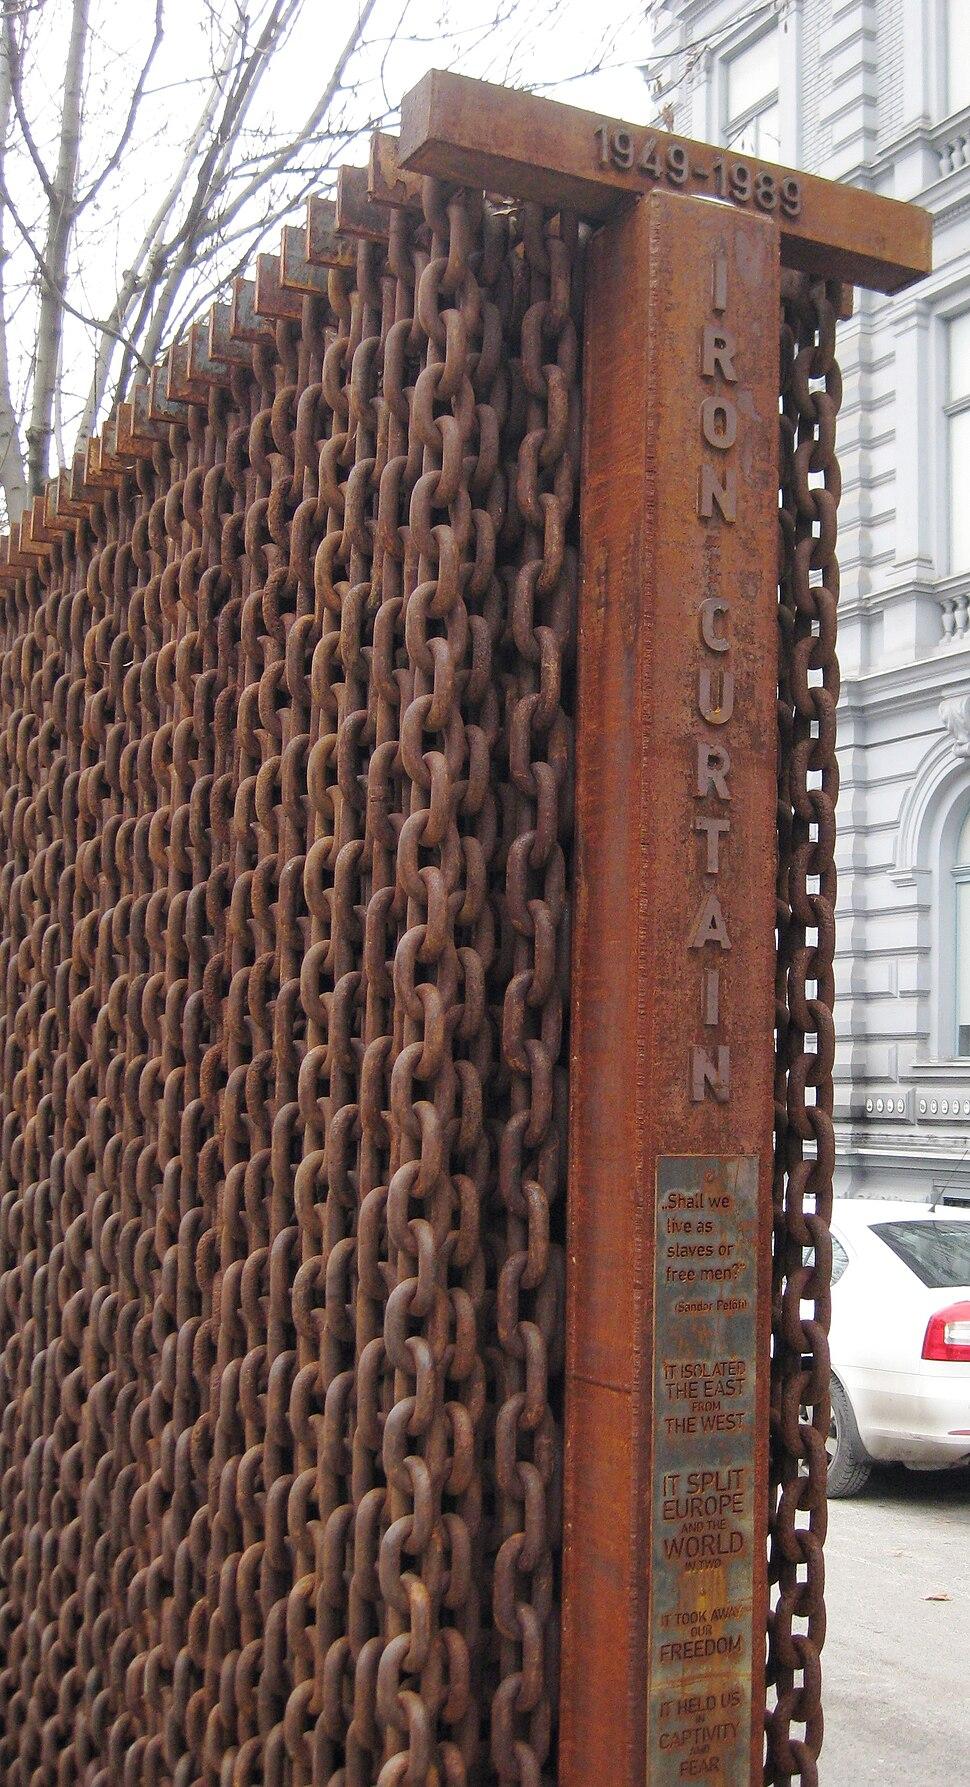 Iron Curtain - Hungary